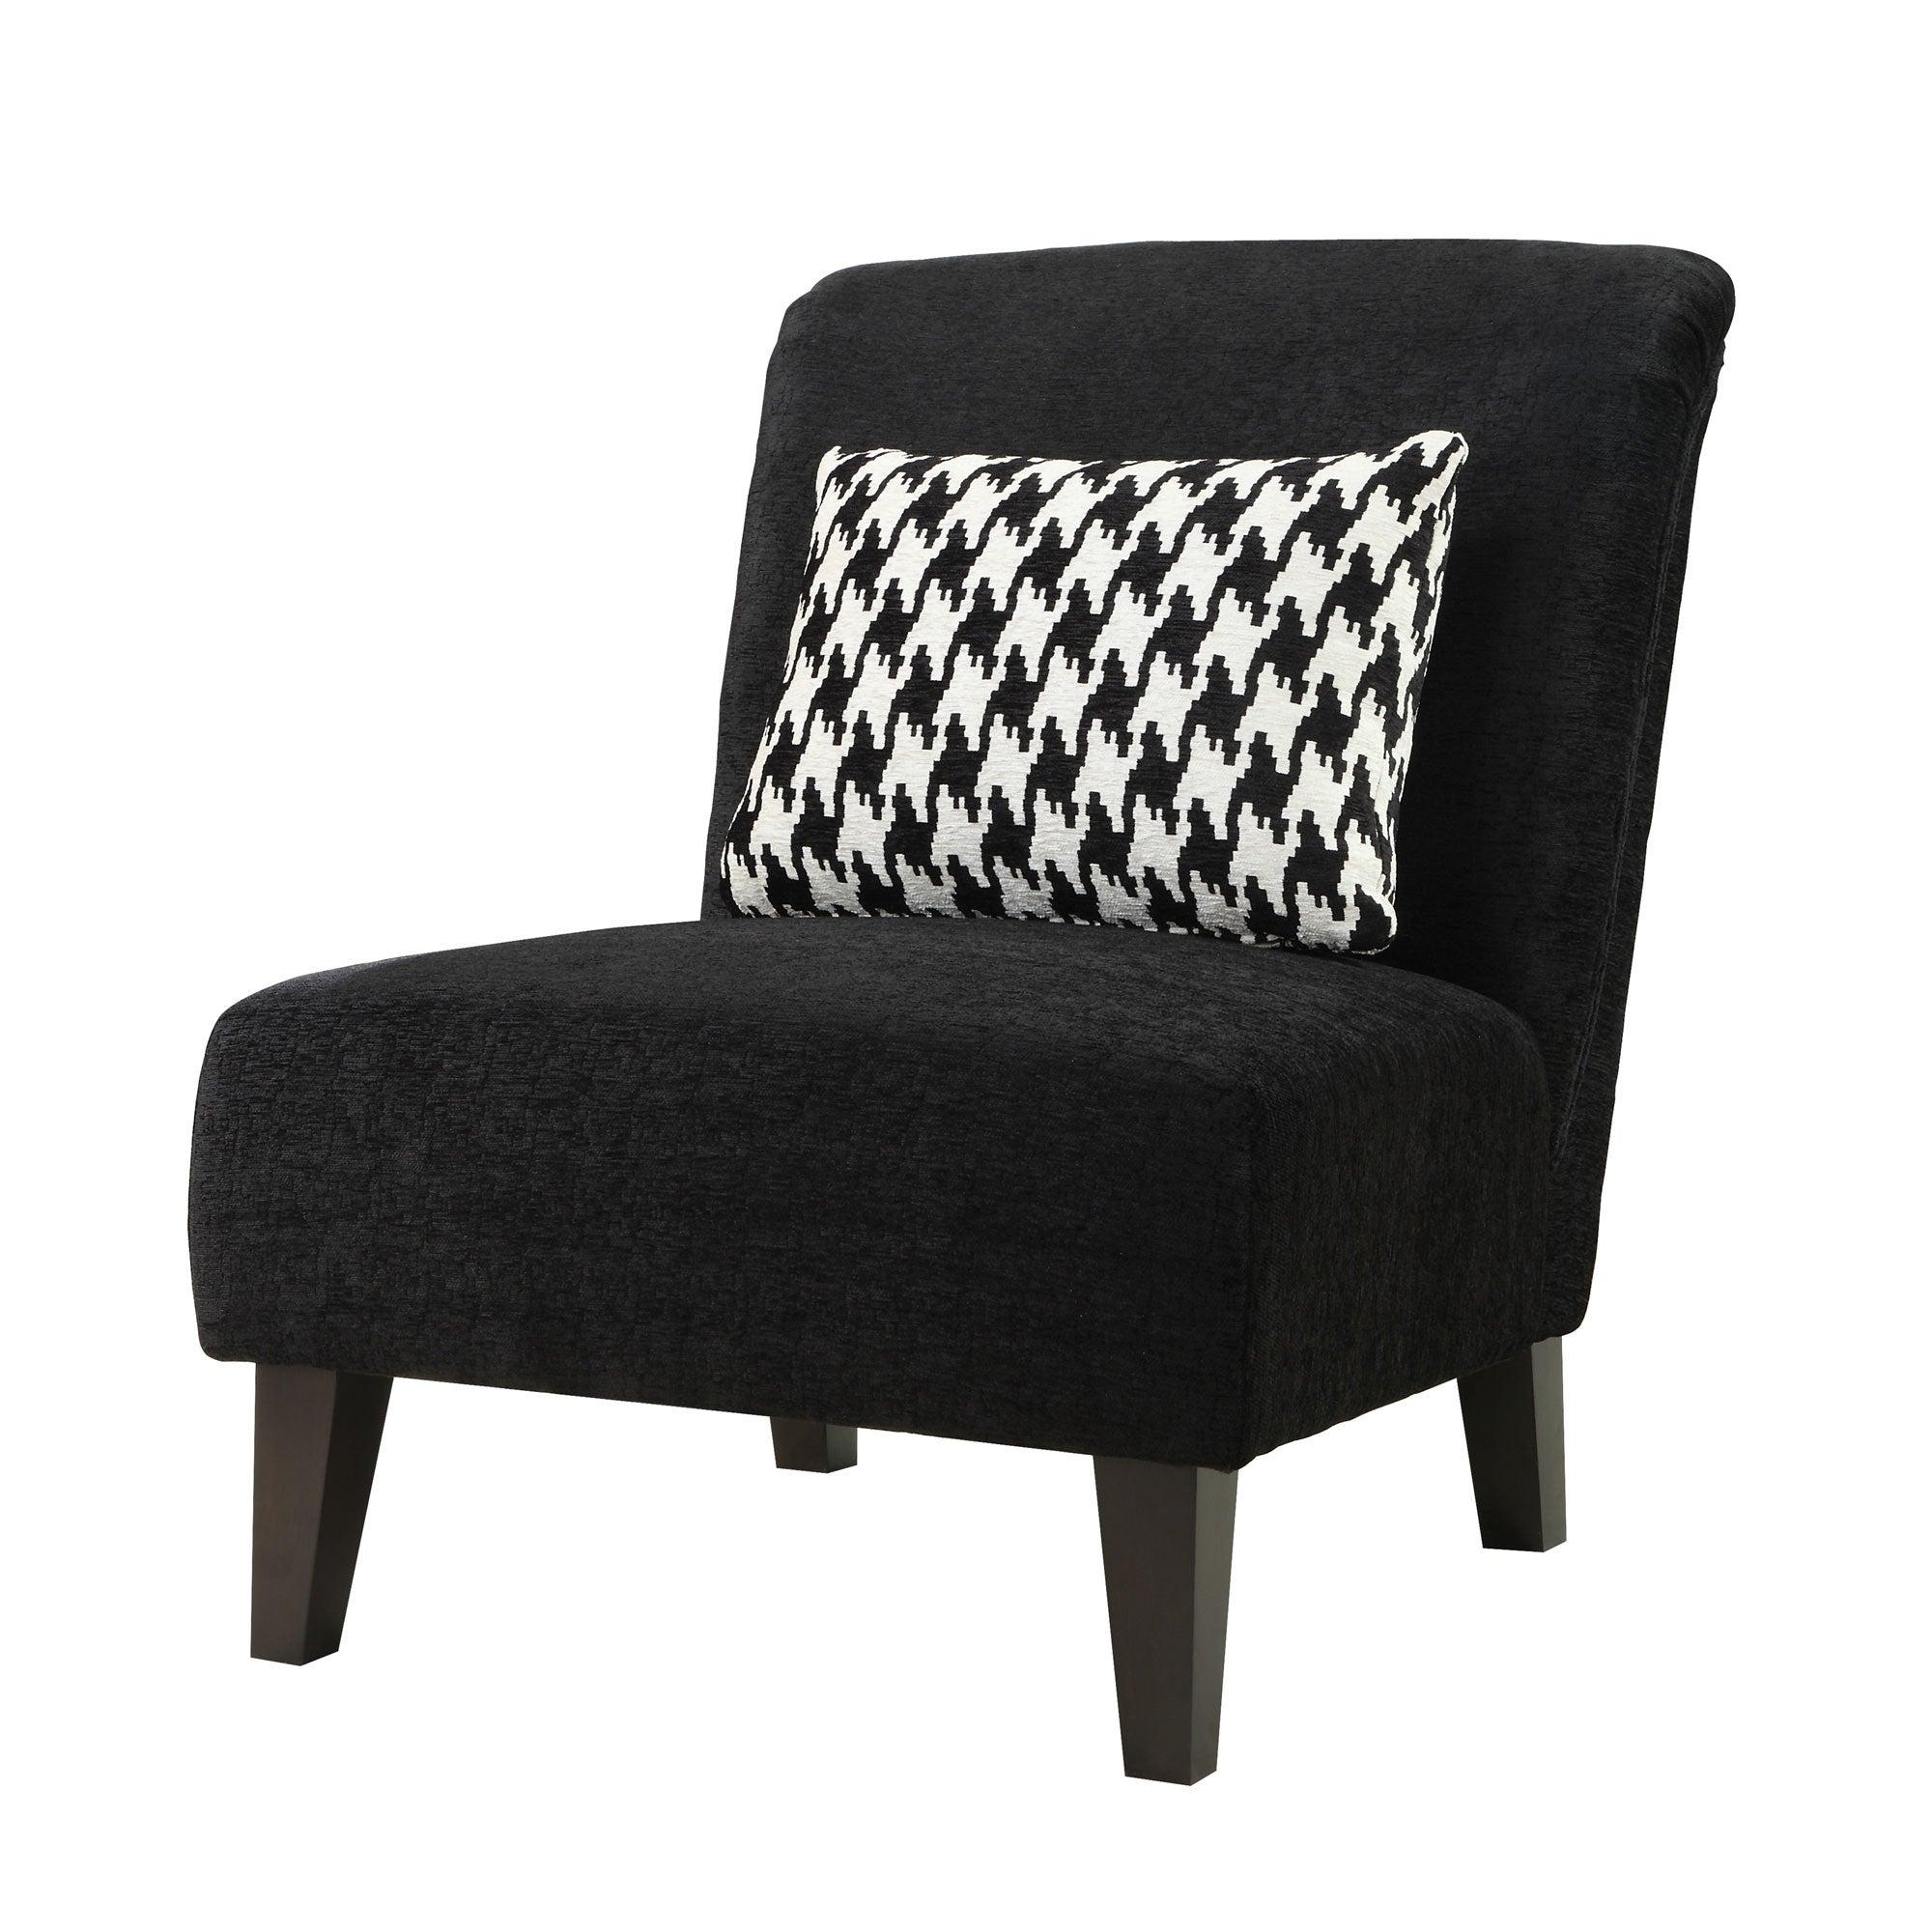 Terrific Anna Black Accent Chair With Houndstooth Grande Pillow Creativecarmelina Interior Chair Design Creativecarmelinacom